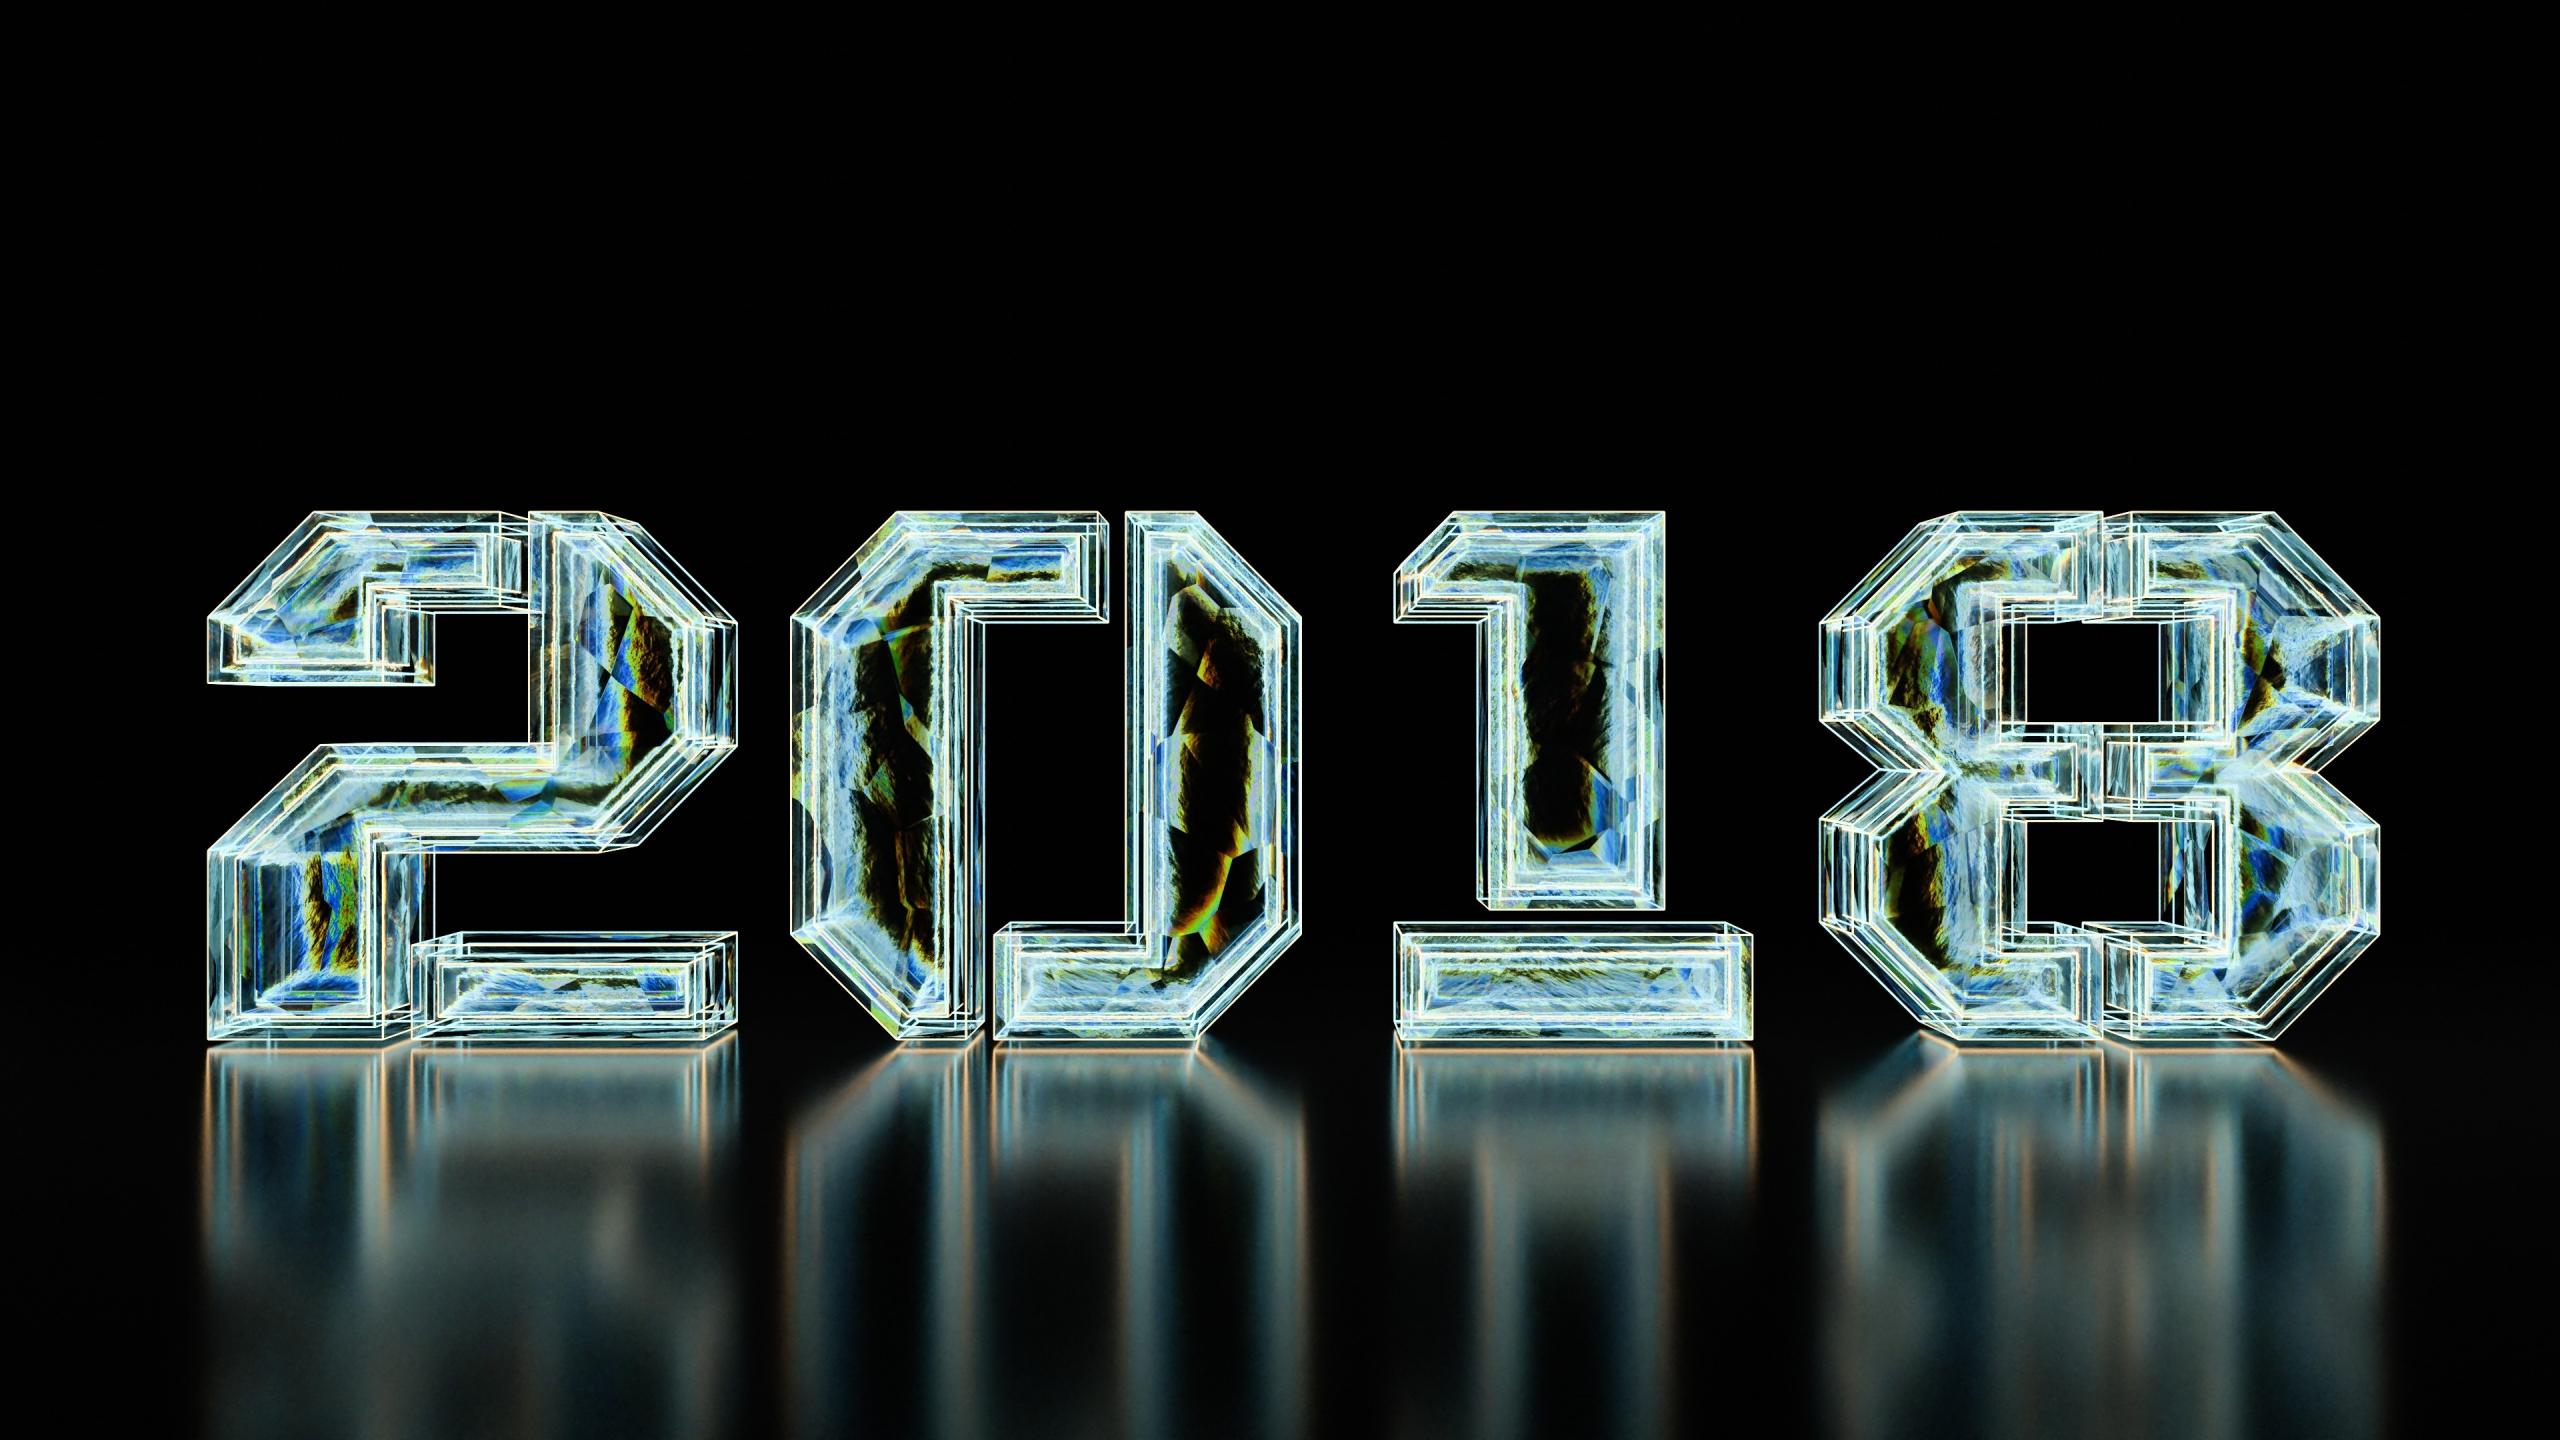 2560x1440 wallpaper New year, 2018, typography, digital art